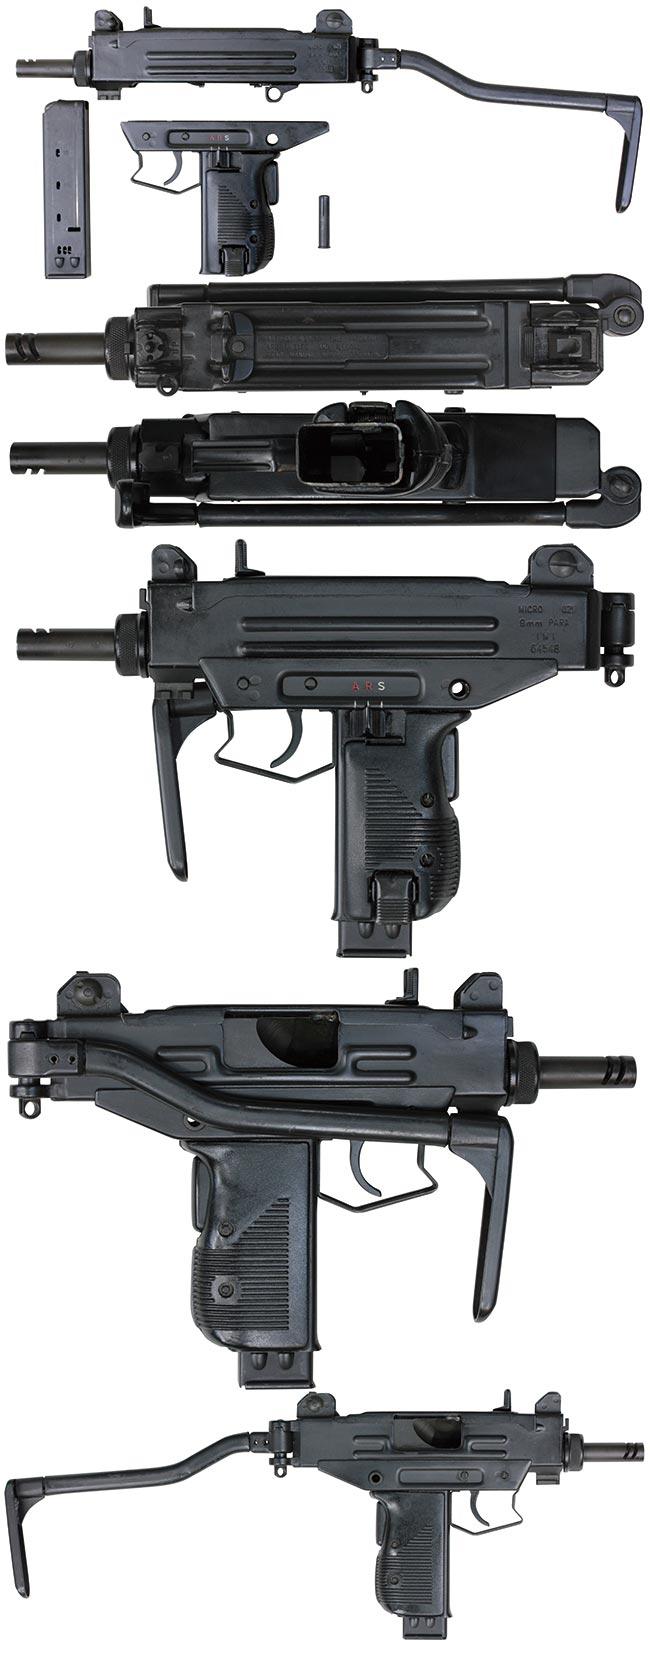 s-マイクロ-UZI-短機関銃-(#64548)分解.jpg